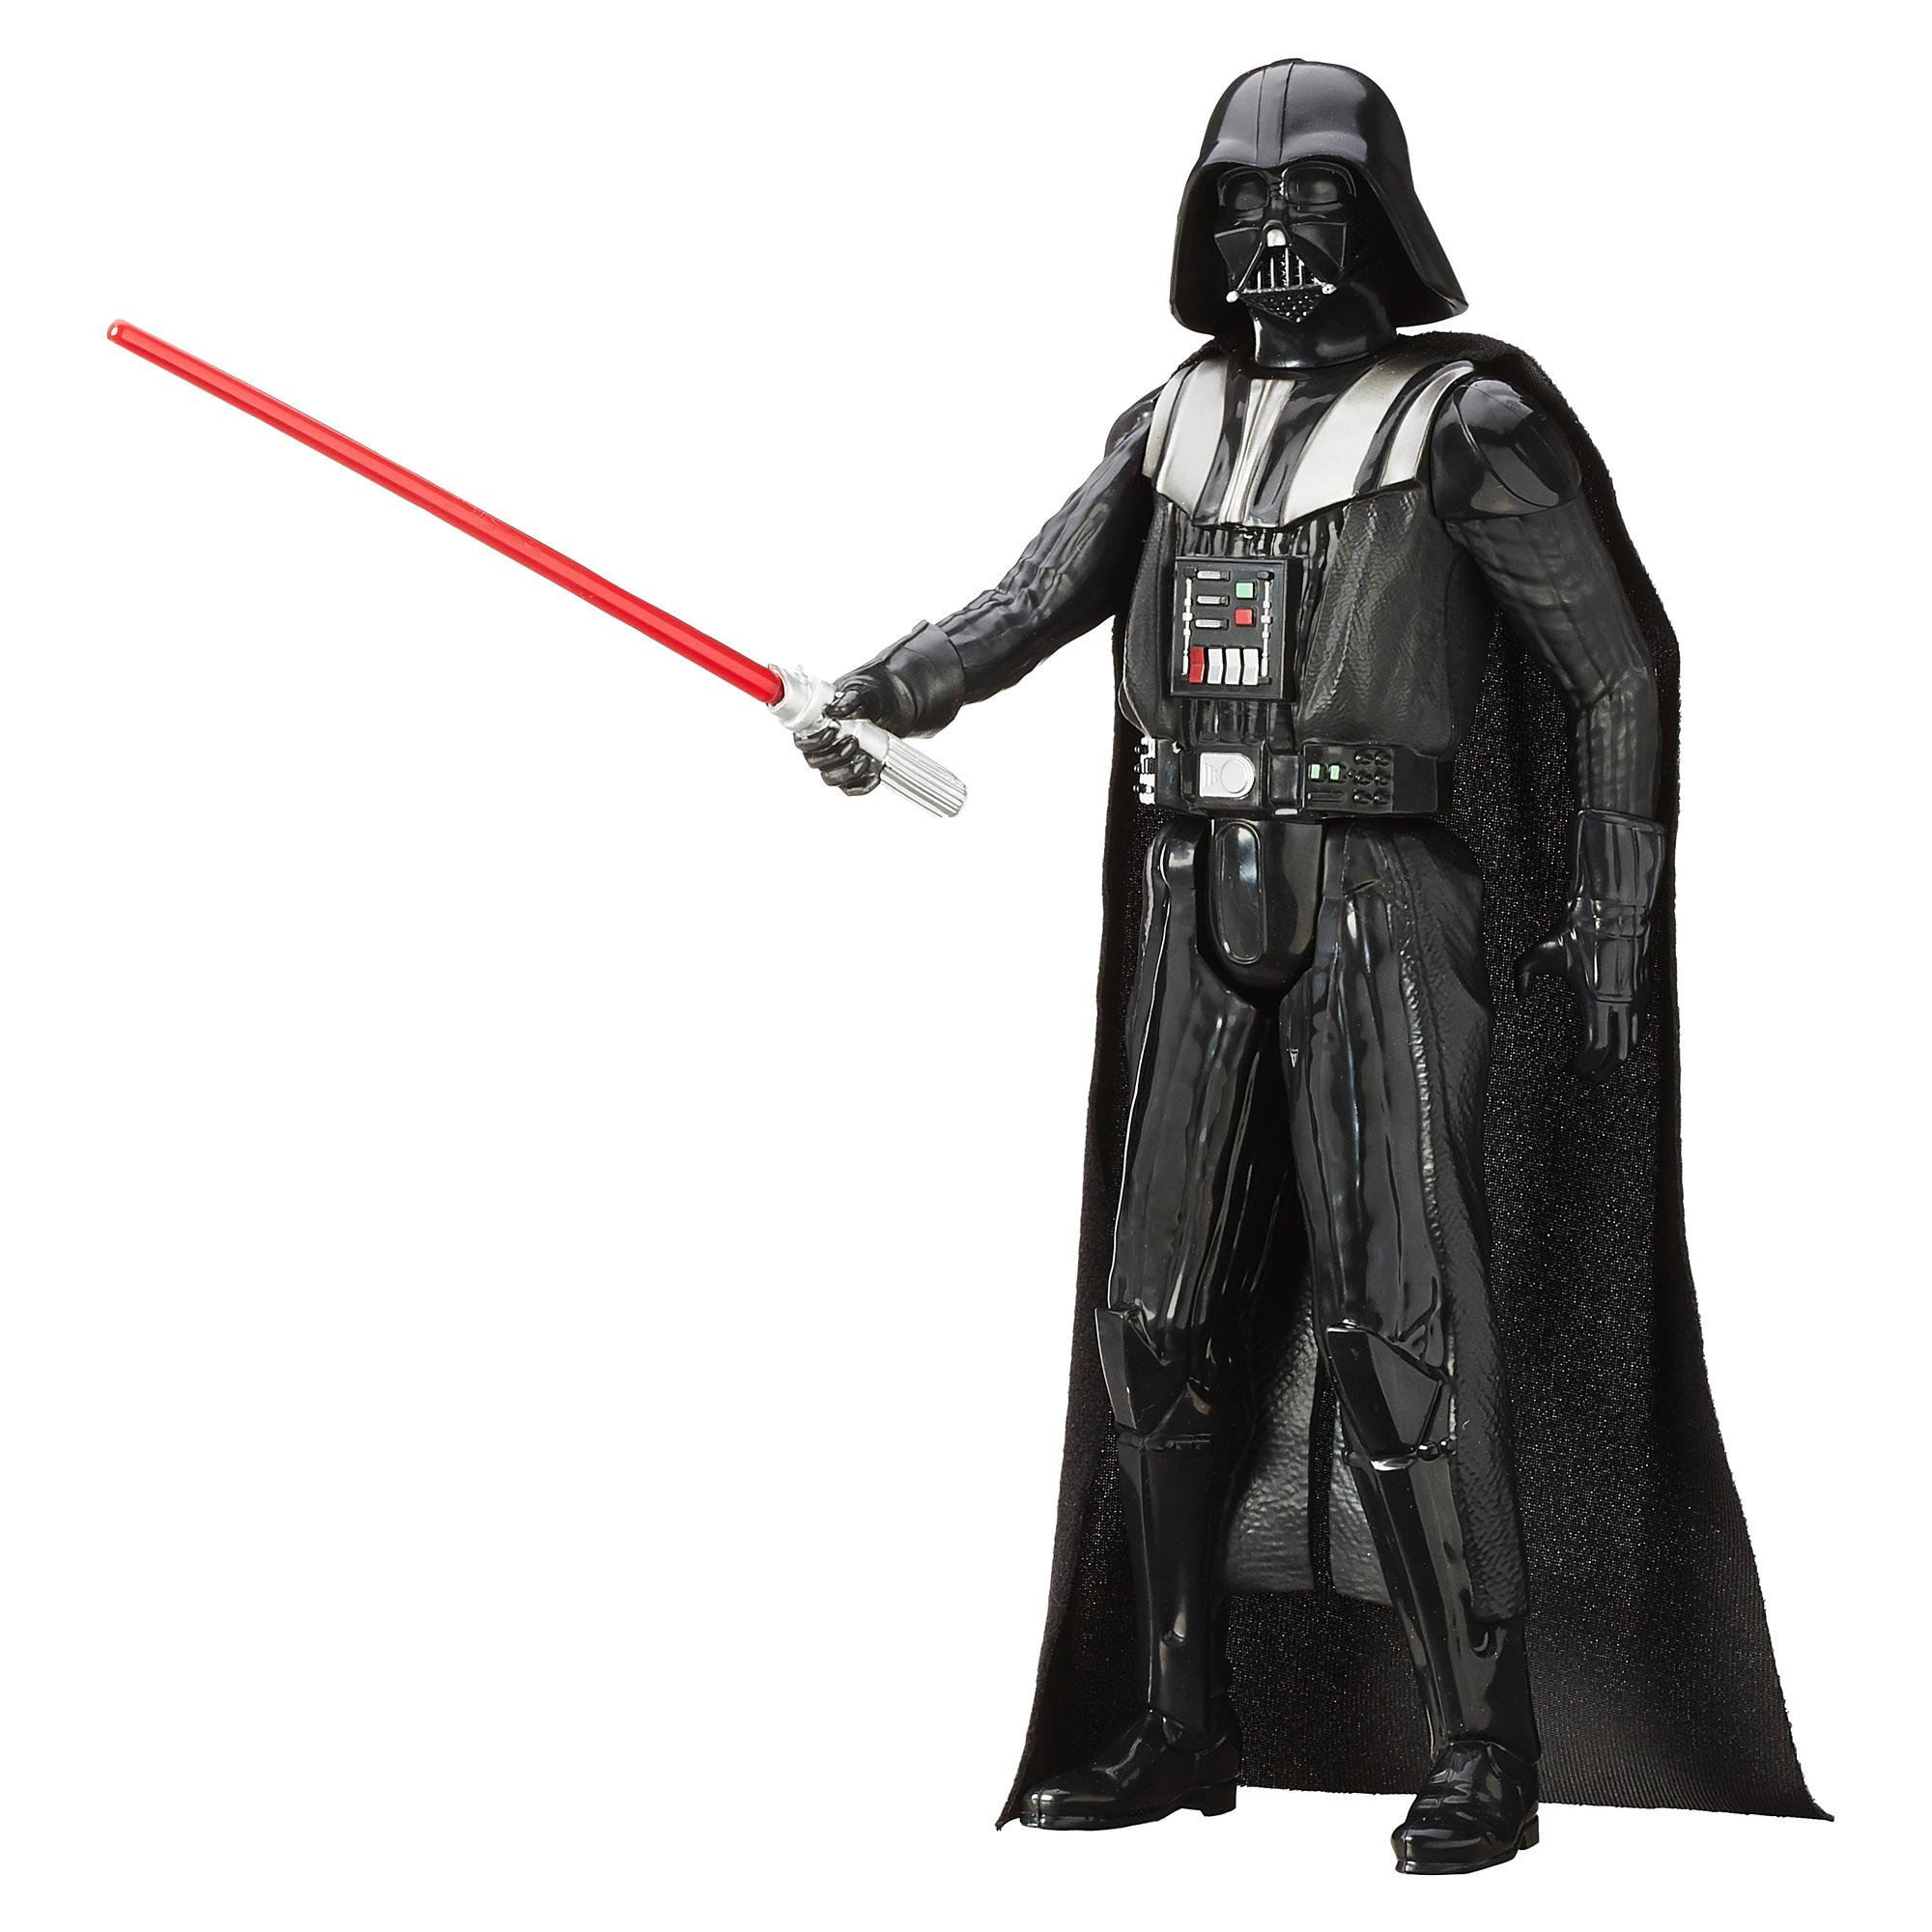 STAR WARS E7 figurka 30 cm Darth Vader